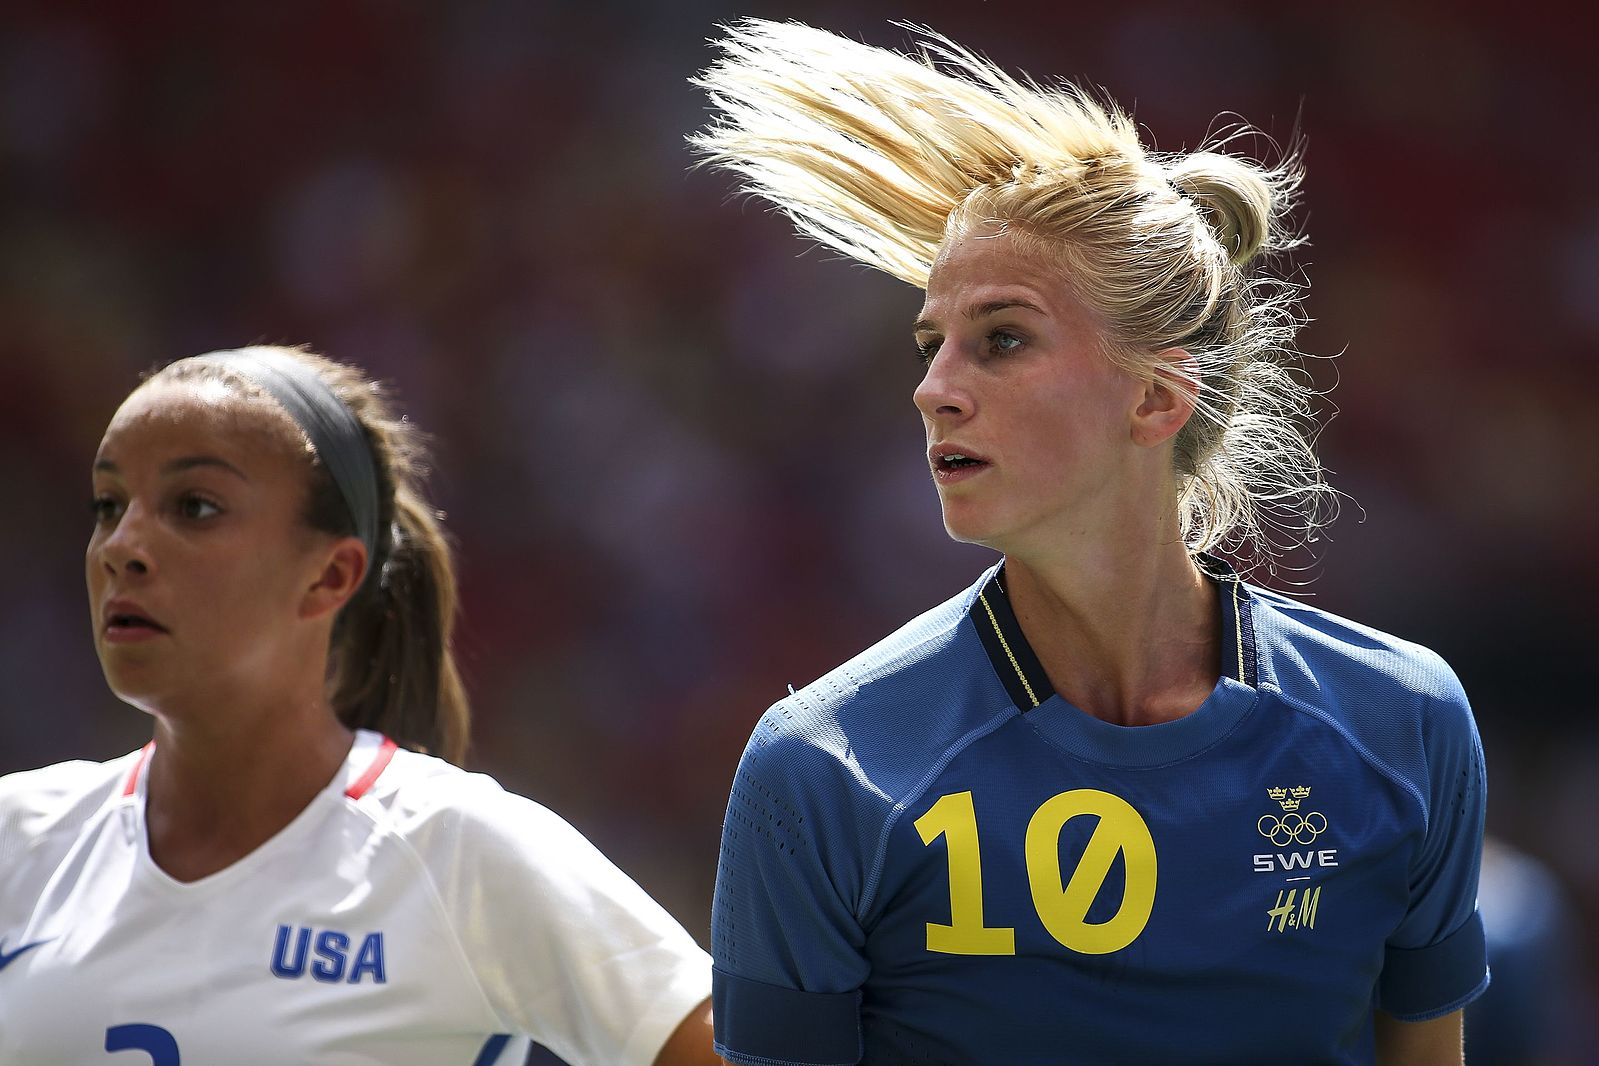 Sofia Jakobsson, ©Marcelo Camargo/Agência Brasil, https://commons.wikimedia.org/wiki/File:A_sele%C3%A7%C3%A3o_feminina_de_futebol_dos_EUA_enfrenta_a_Su%C3%A9cia_(28654895110).jpg